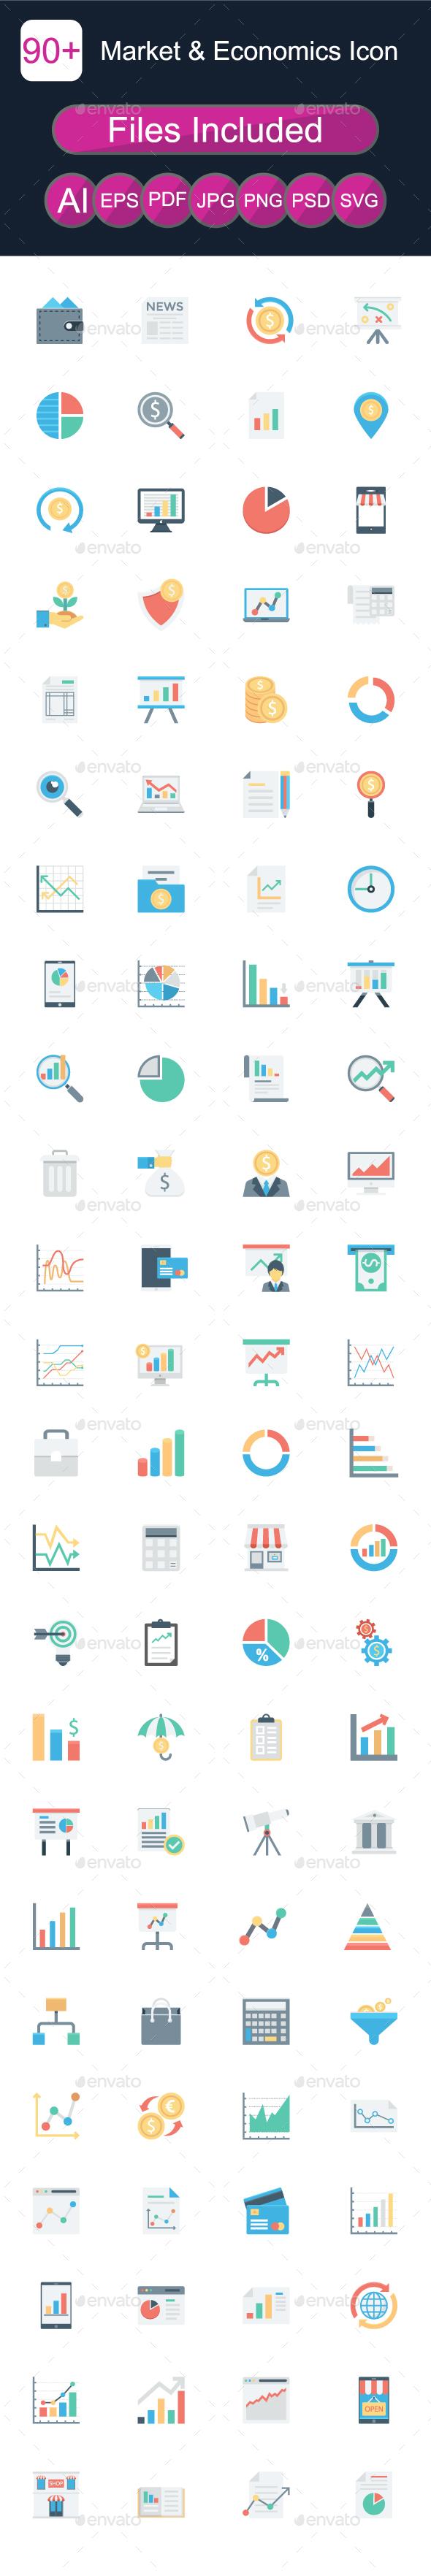 GraphicRiver Market & Economics Icon 20663978